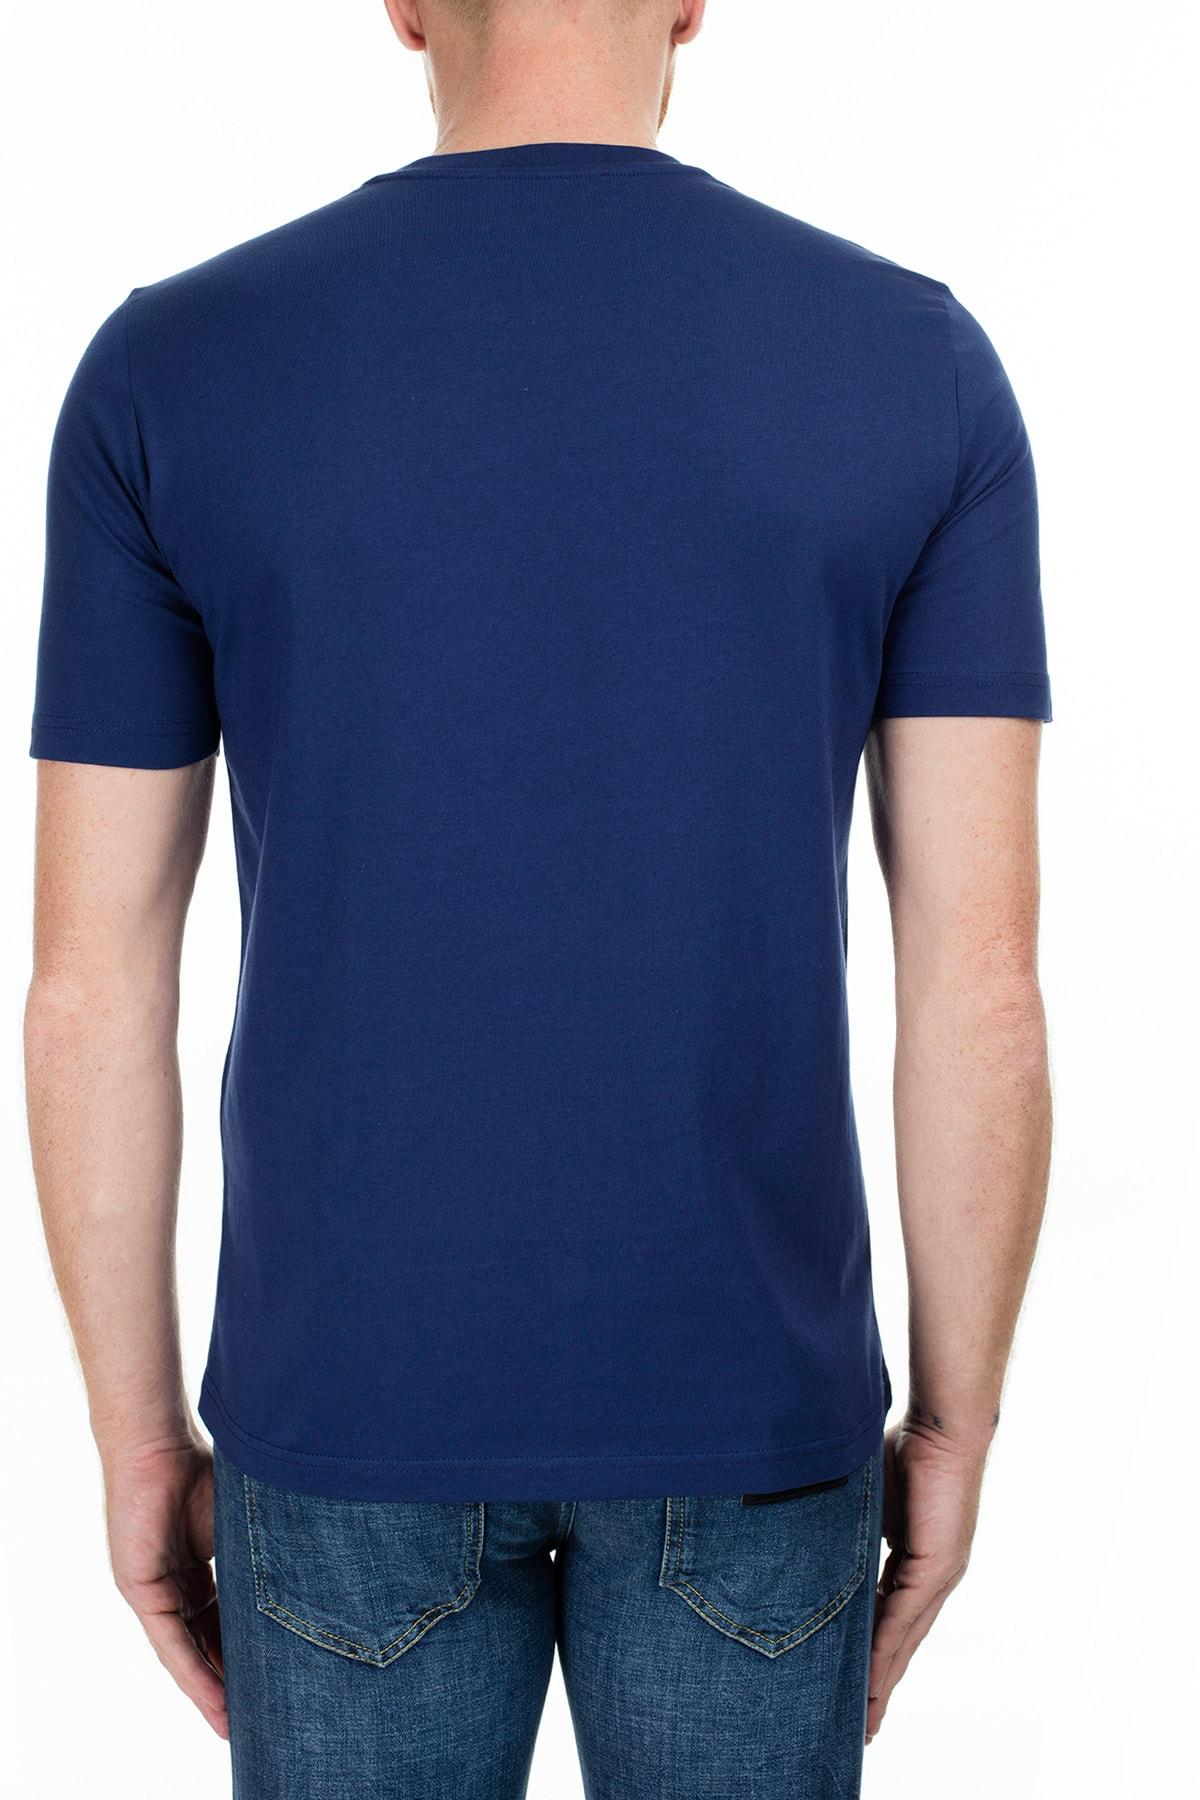 Love Moschino Erkek Lacivert T-Shirt S M47322Rm3876 Y56 2